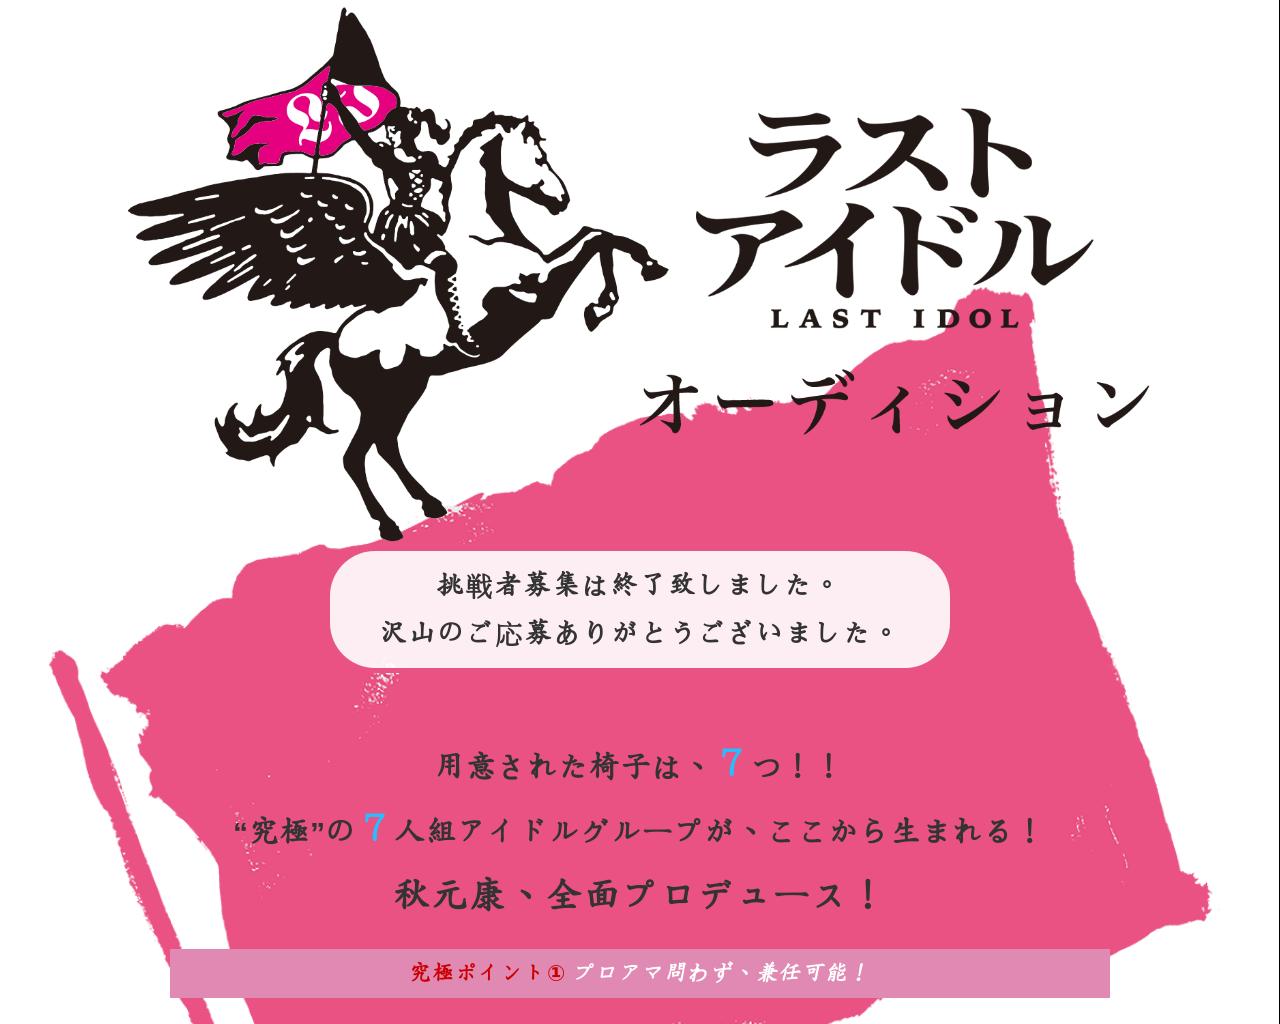 last-idol.jp(2017/12/18 02:30:42)